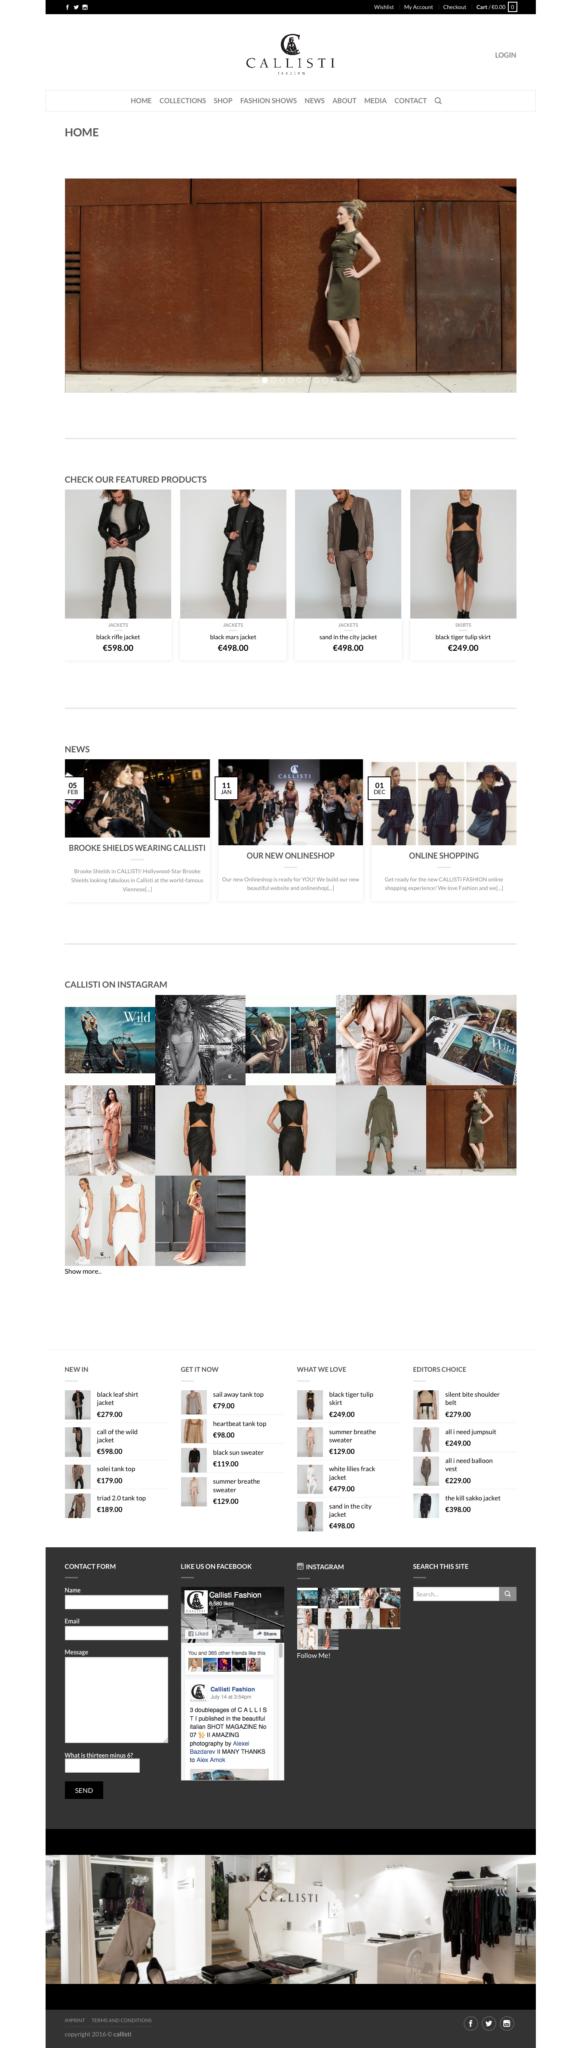 Callisti Website Design 36 digital&more